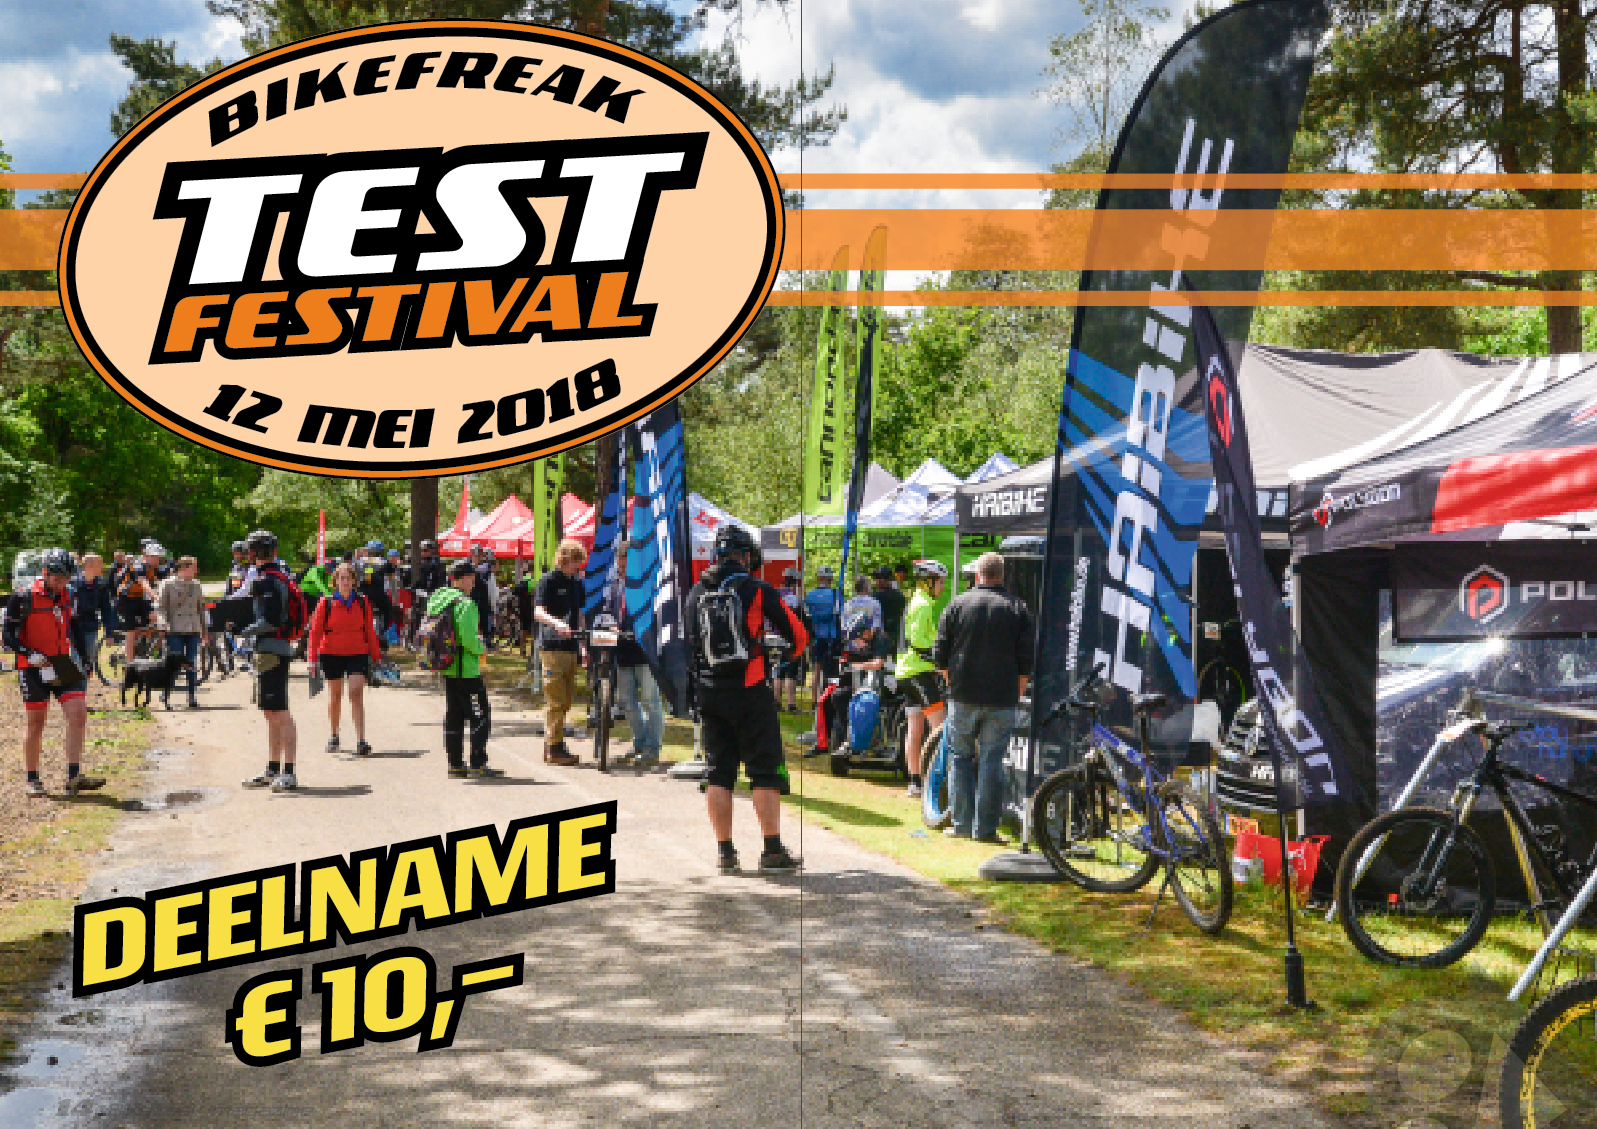 Bikefreak-test-festival-2018